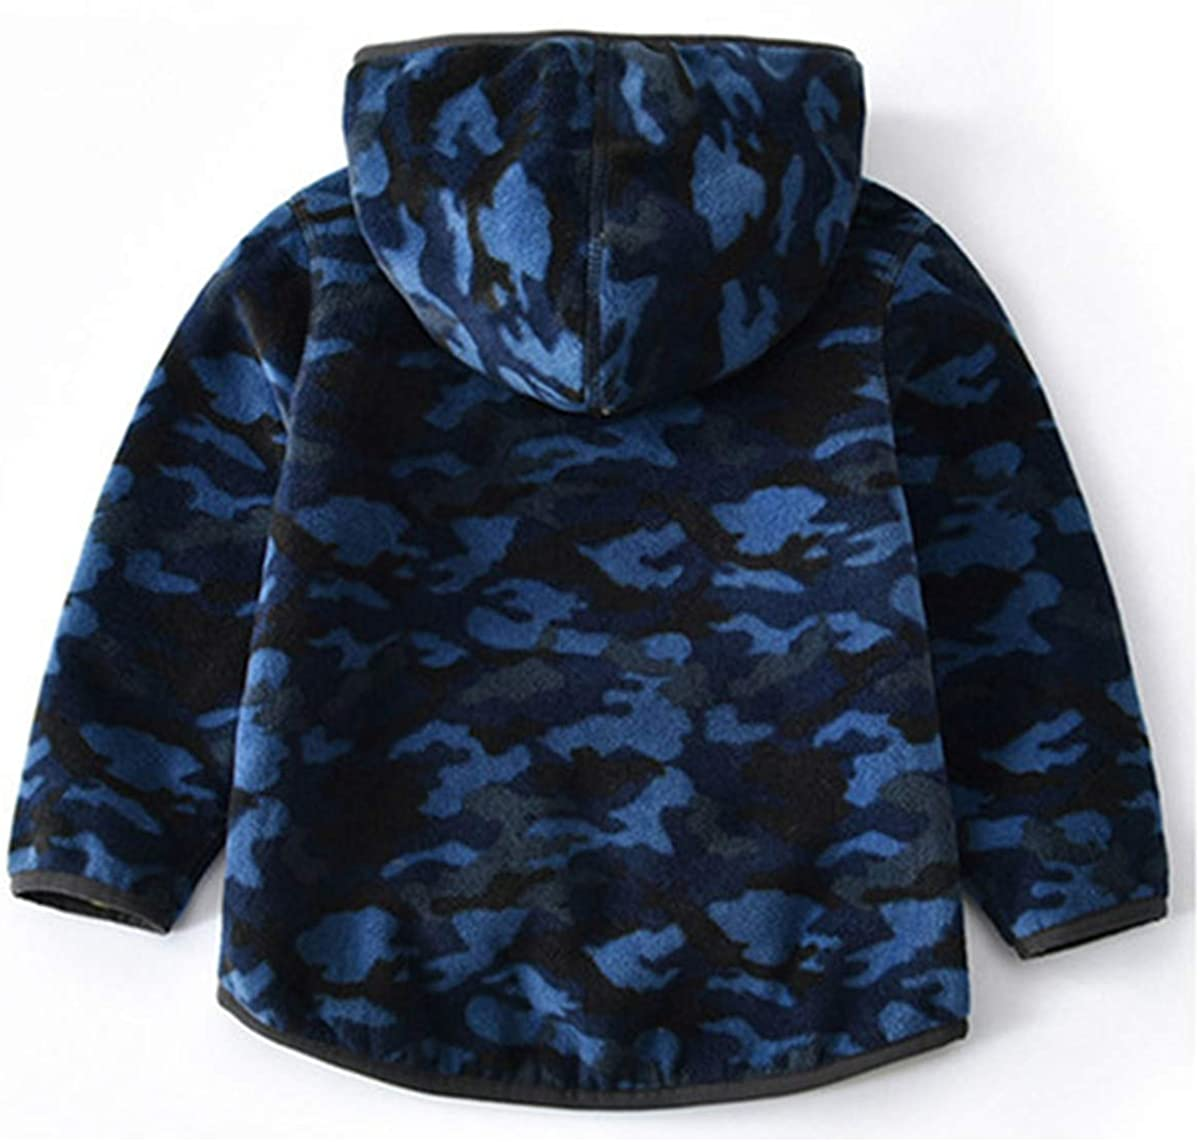 Vine Boys Polar Fleece Jackets Hoodie Jackets Reversible Coats Spring Outerwear